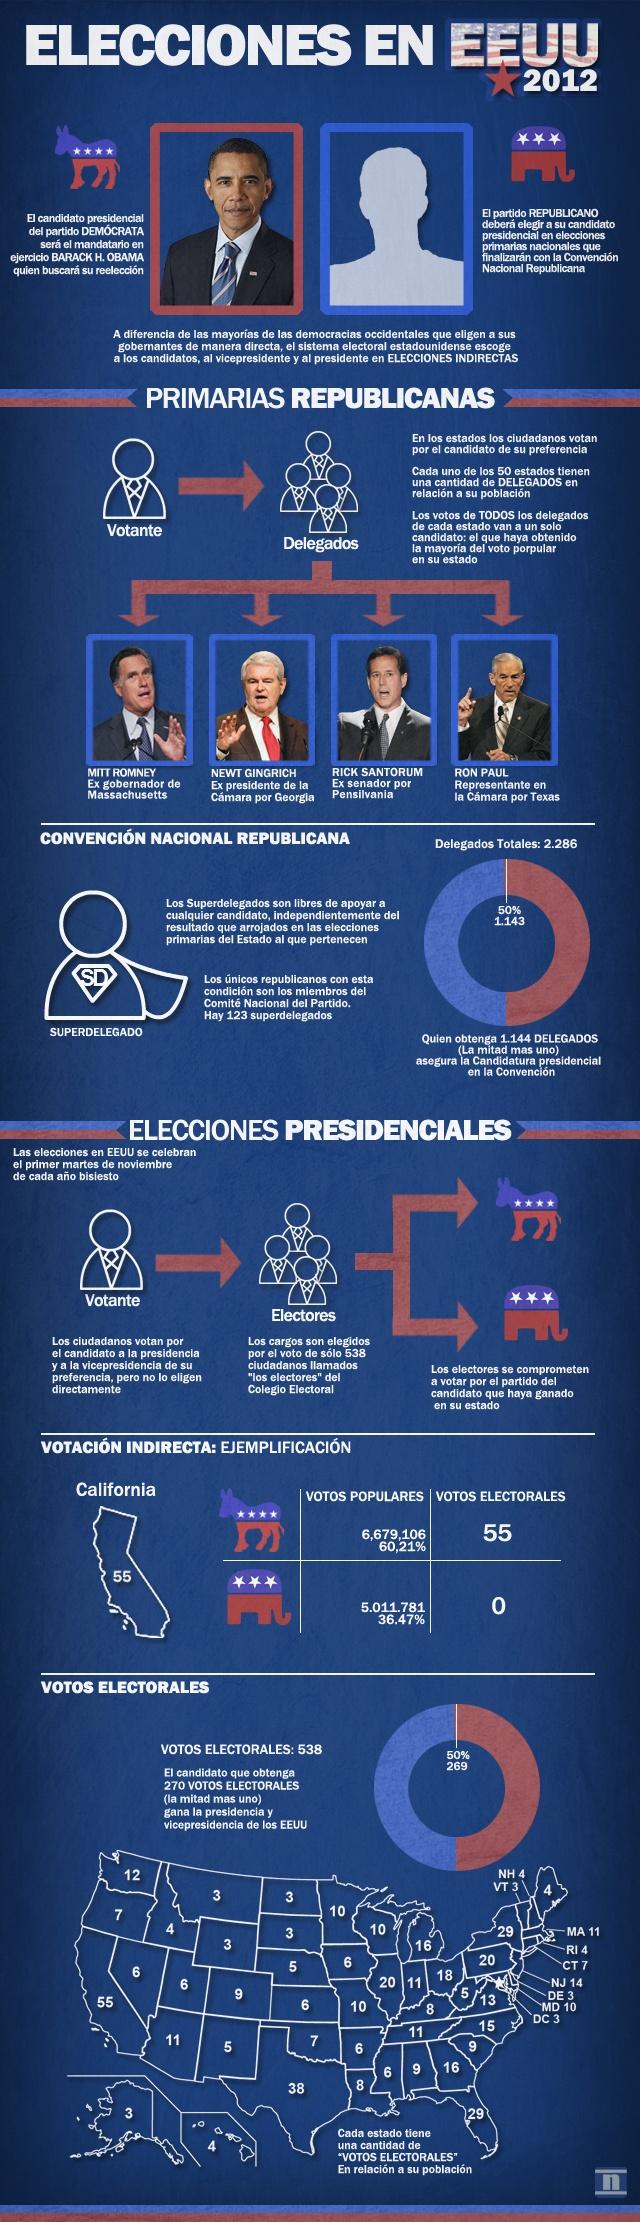 #Elecciones en #EEUU #infografia